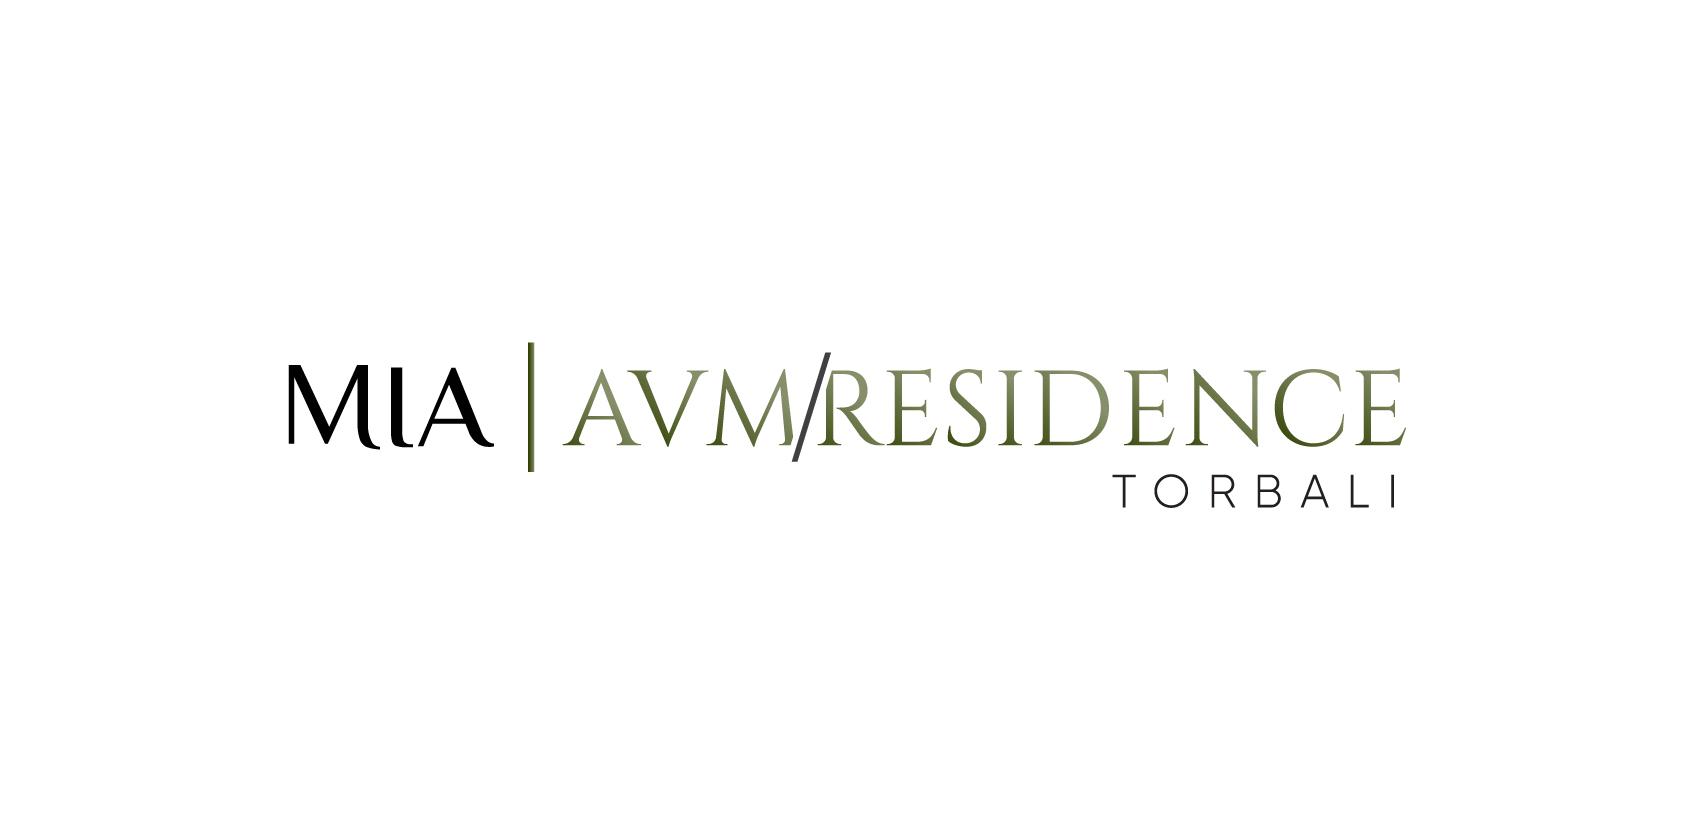 Mia AVM Residence Torbalı